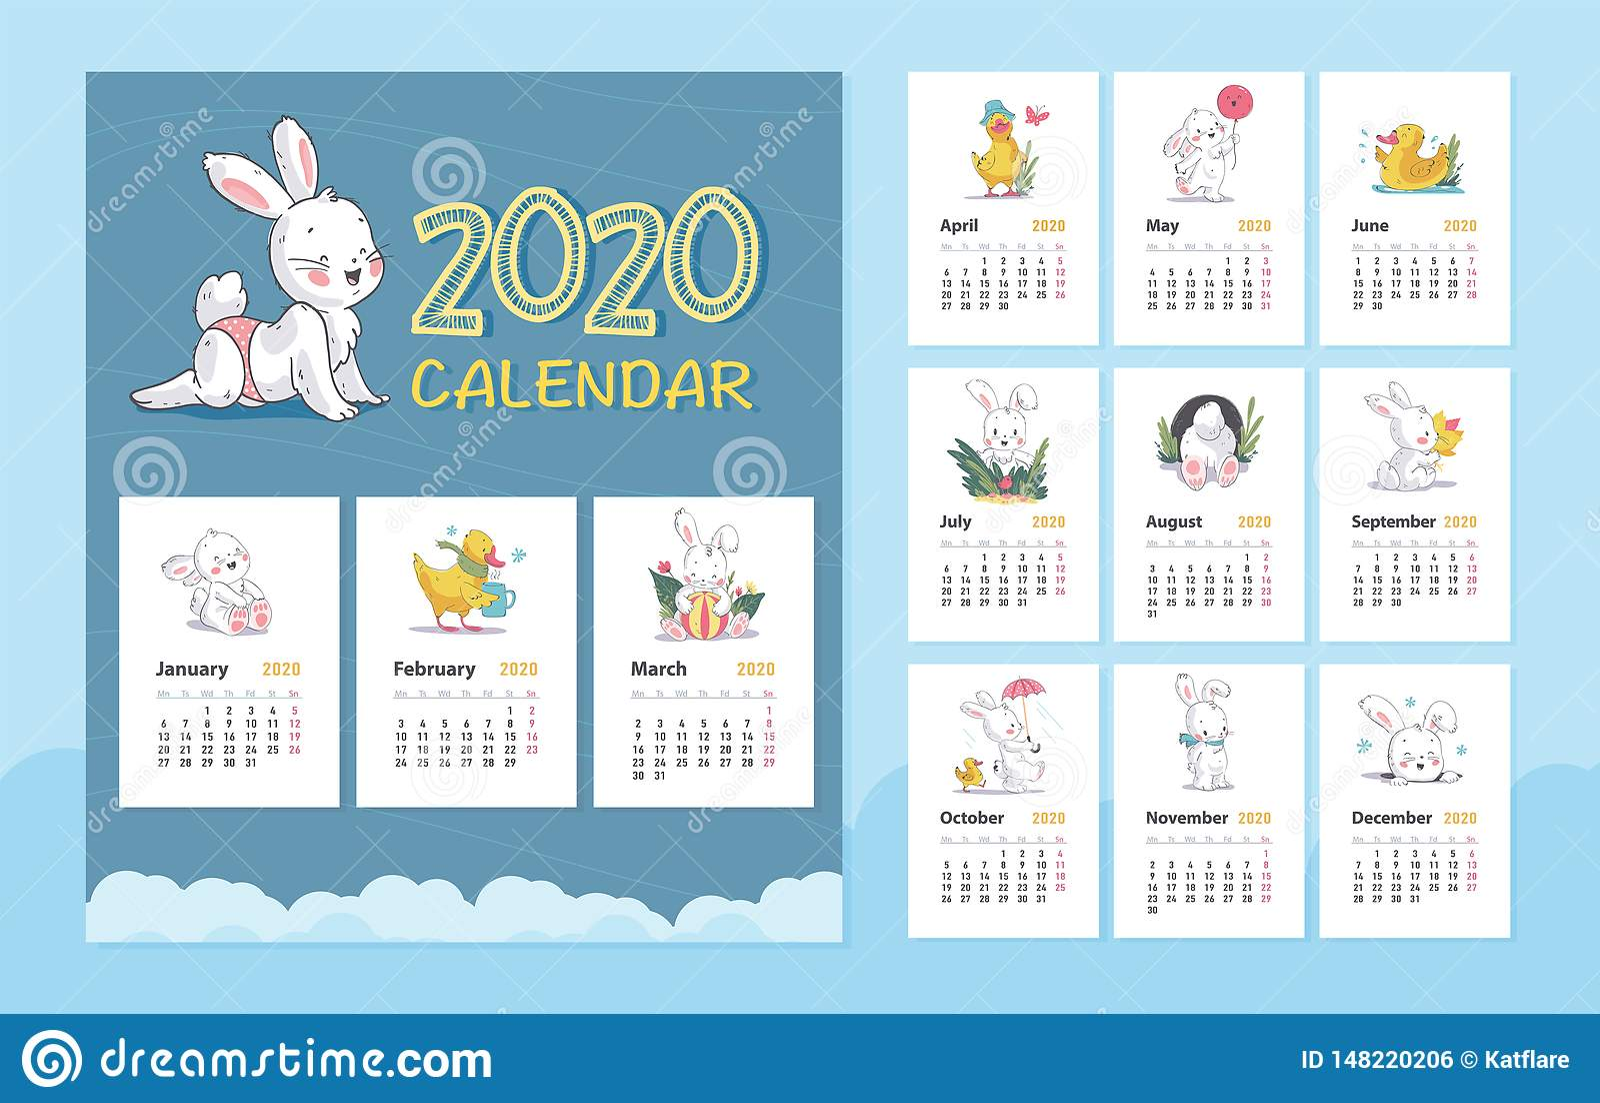 Vector 2020 Baby Calendar Design Template With Cute White Bunny Animal Character Little Yellow Duck Walk Stand Sit Ilustração Do Vetor Ilustração De Yellow 2020 148220206